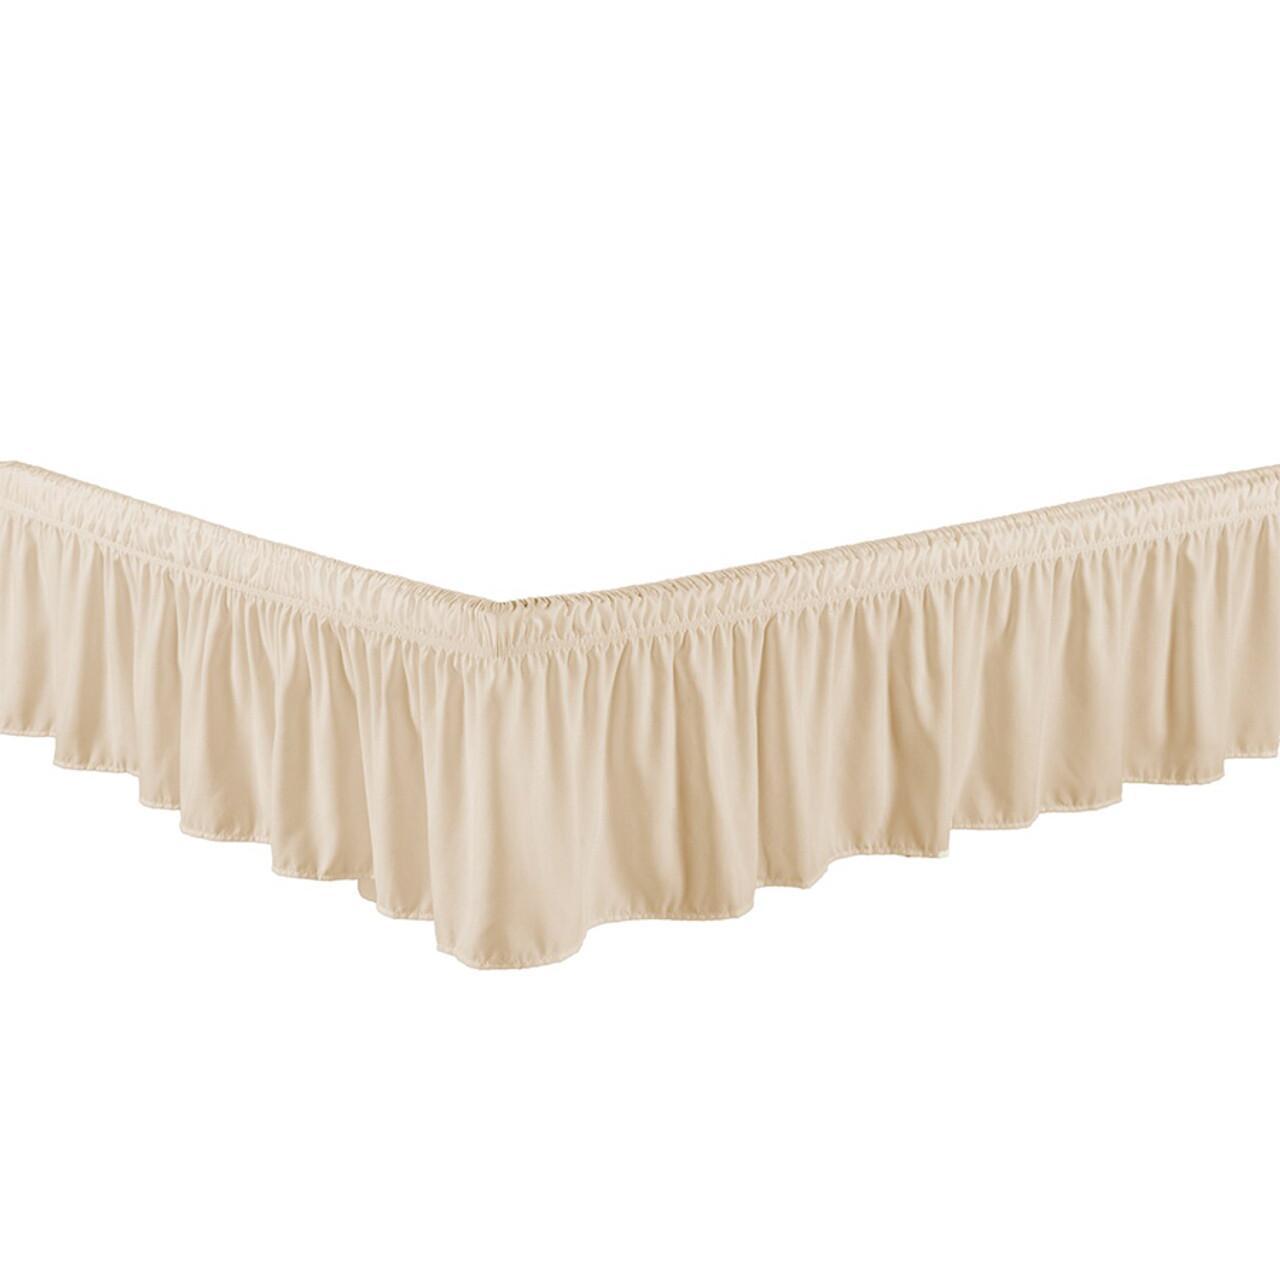 "Beige Bed Skirt Dust Ruffle 100% Brushed Microfiber with 14"" Drop in USA, California, New York, New York City, Los Angeles, San Francisco, Pennsylvania, Washington DC, Virginia, Maryland"